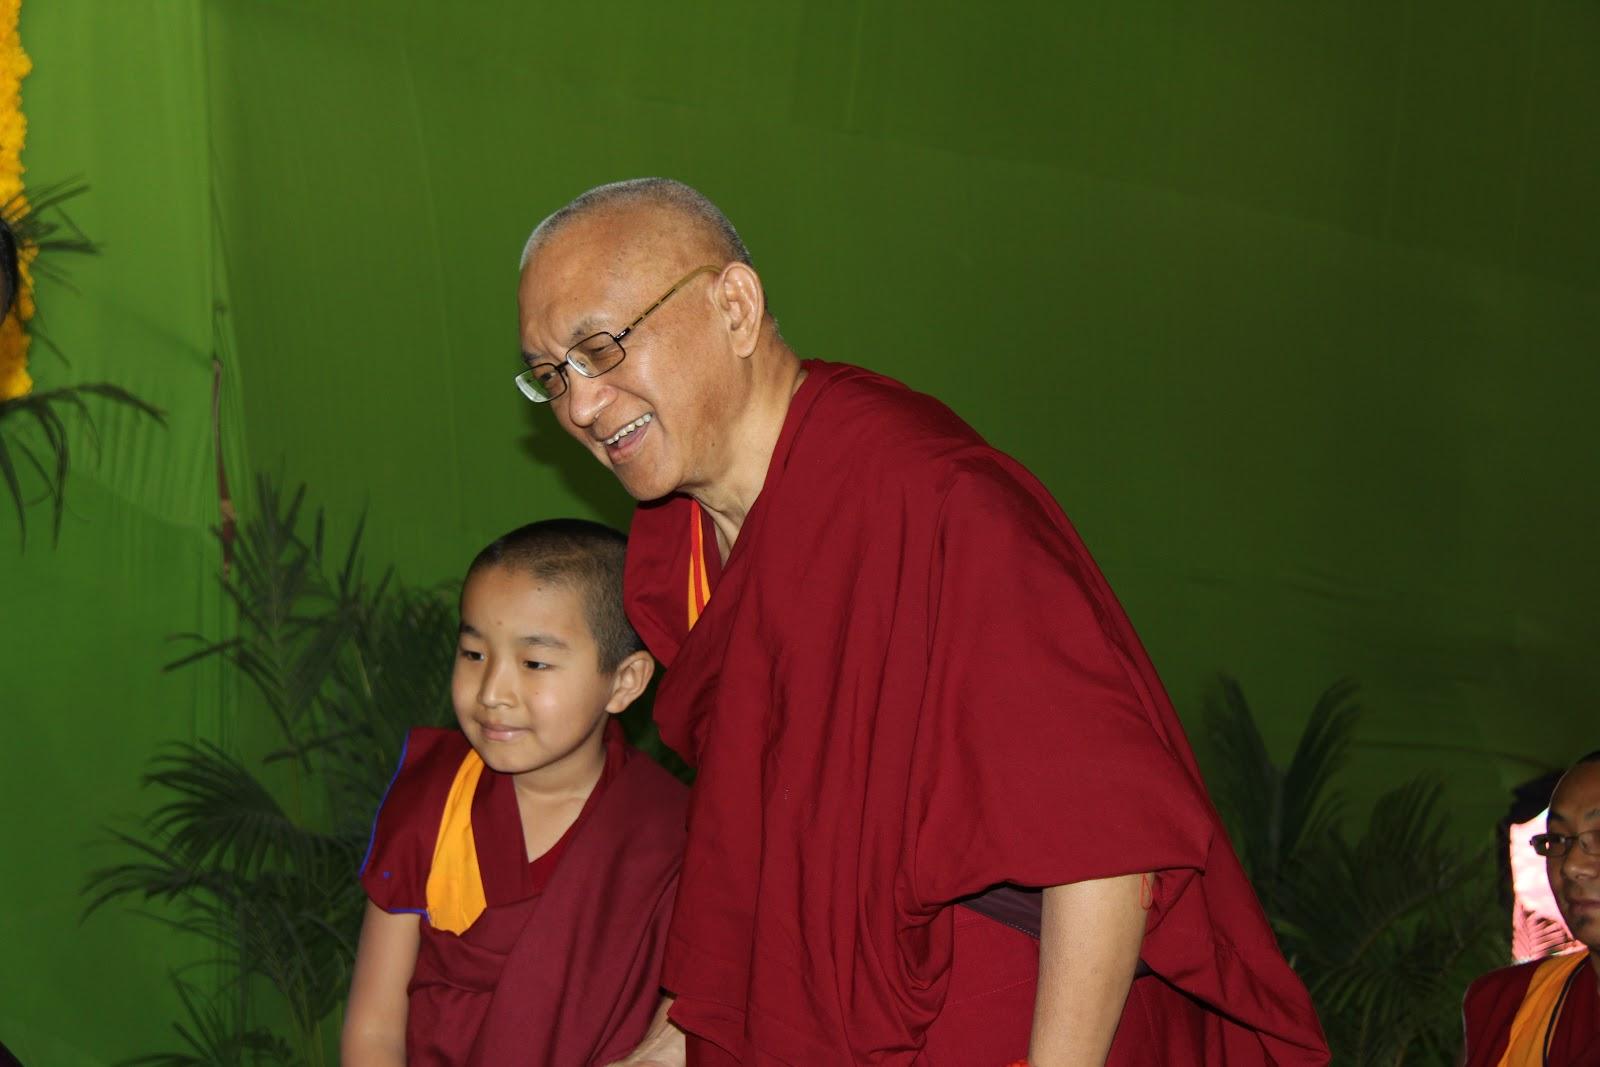 Domo Rinpoche - who Rinpoche supports